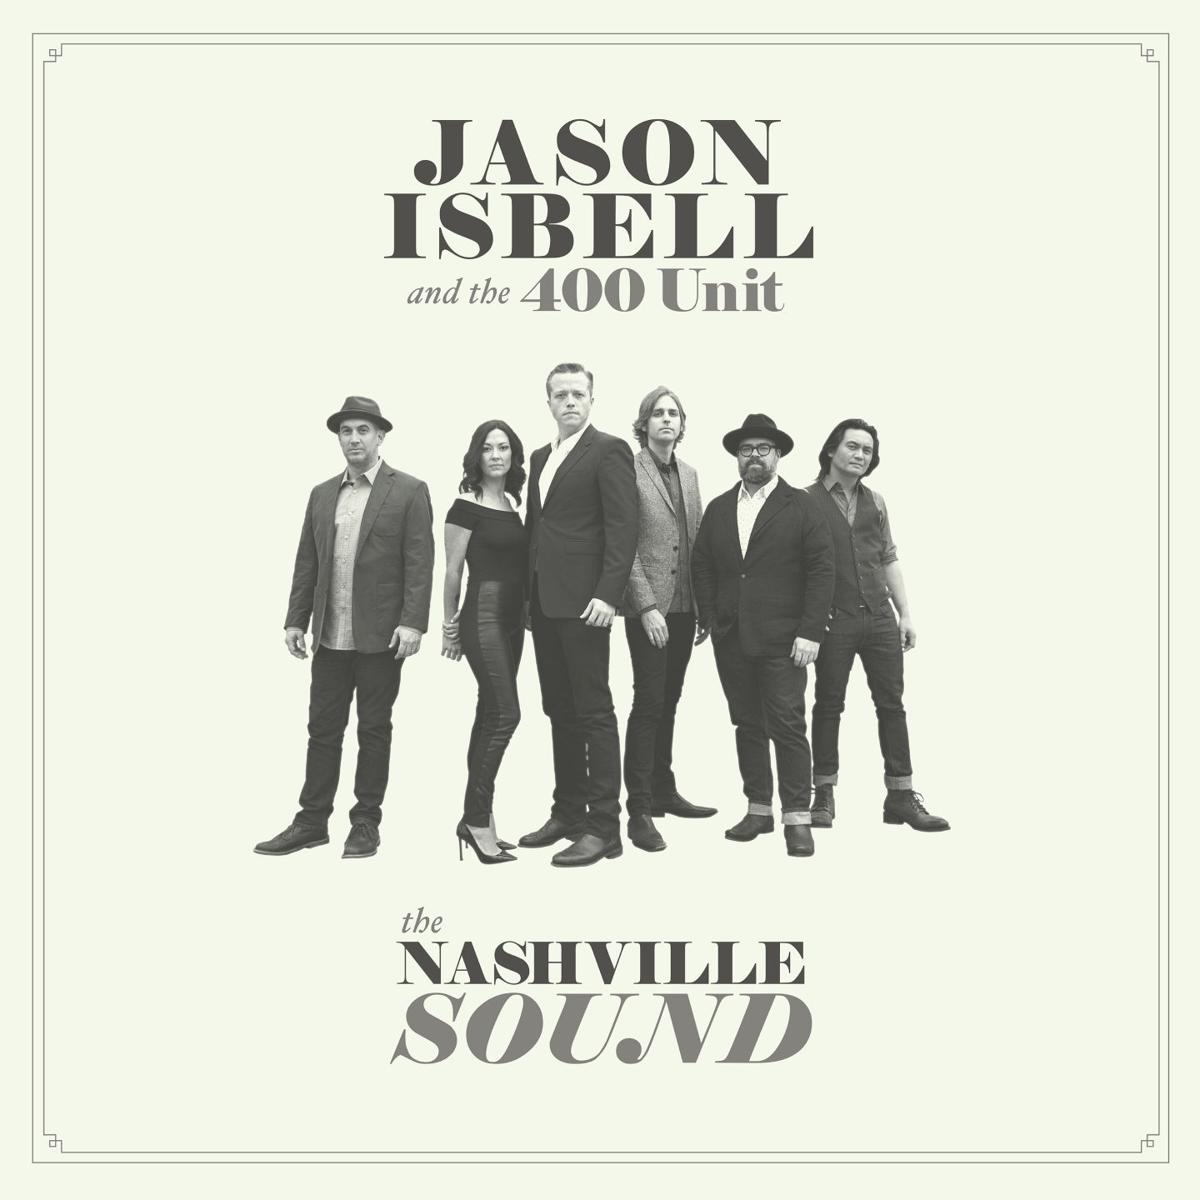 JasonIsbell_theNashvillesound-Cover-Art